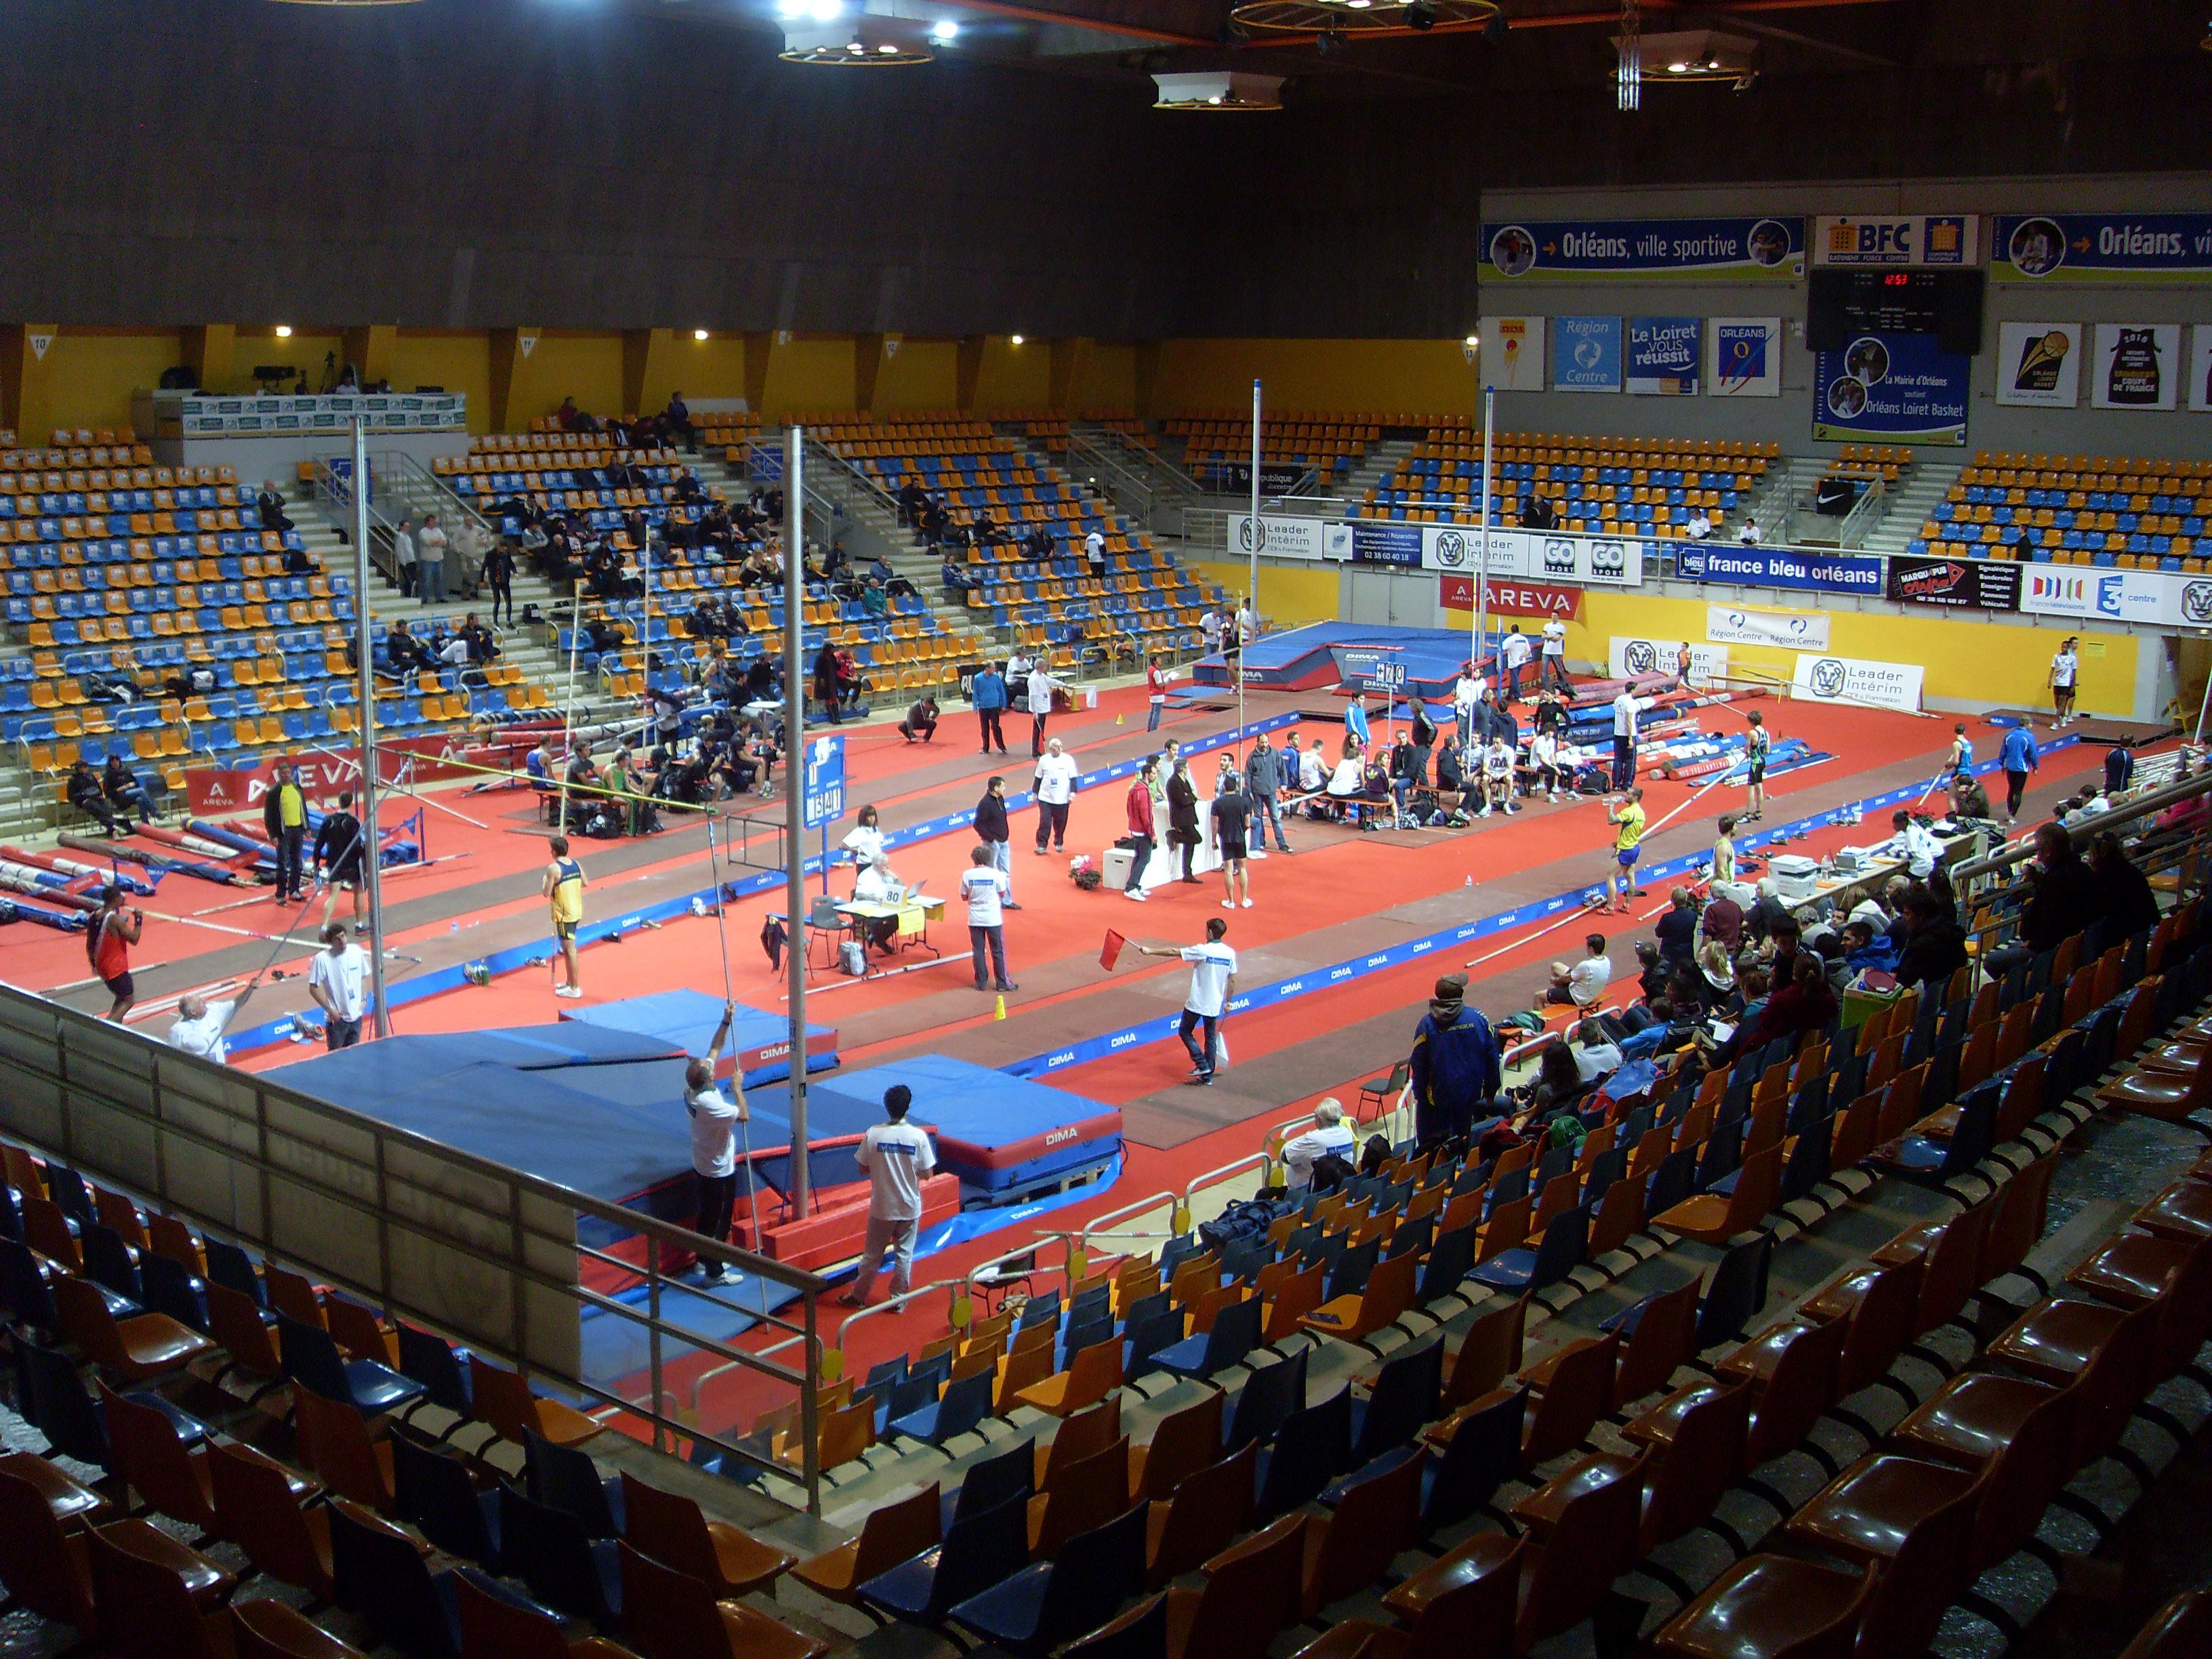 palais des sports orleans wikipedia